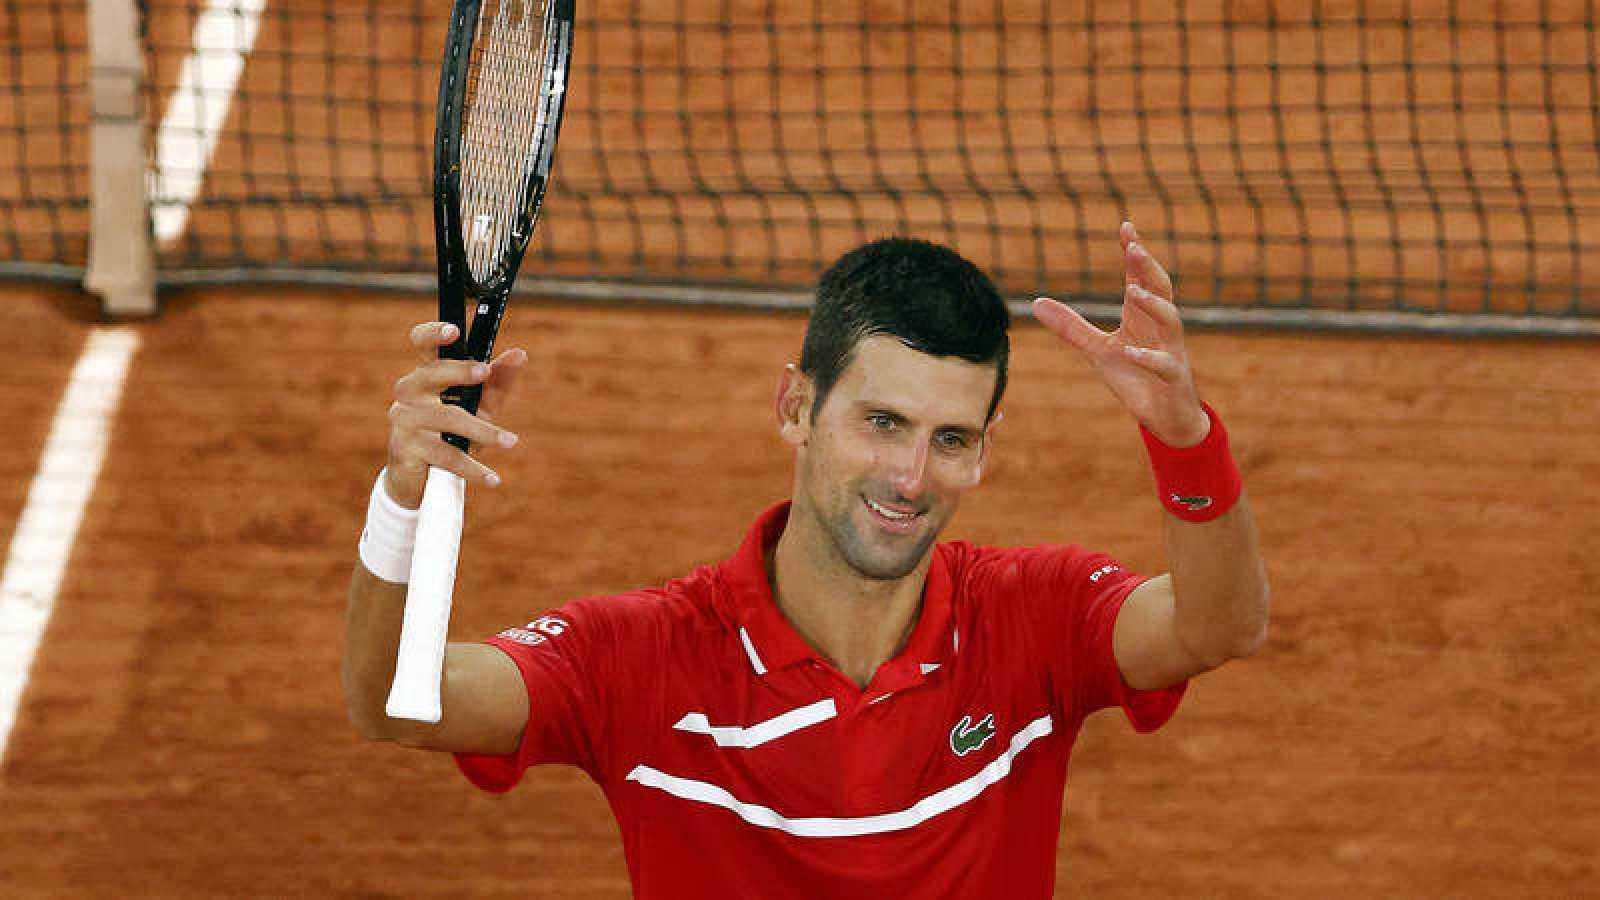 El serbio Novak Djokovic celebra su victoria sobre Khachanov.